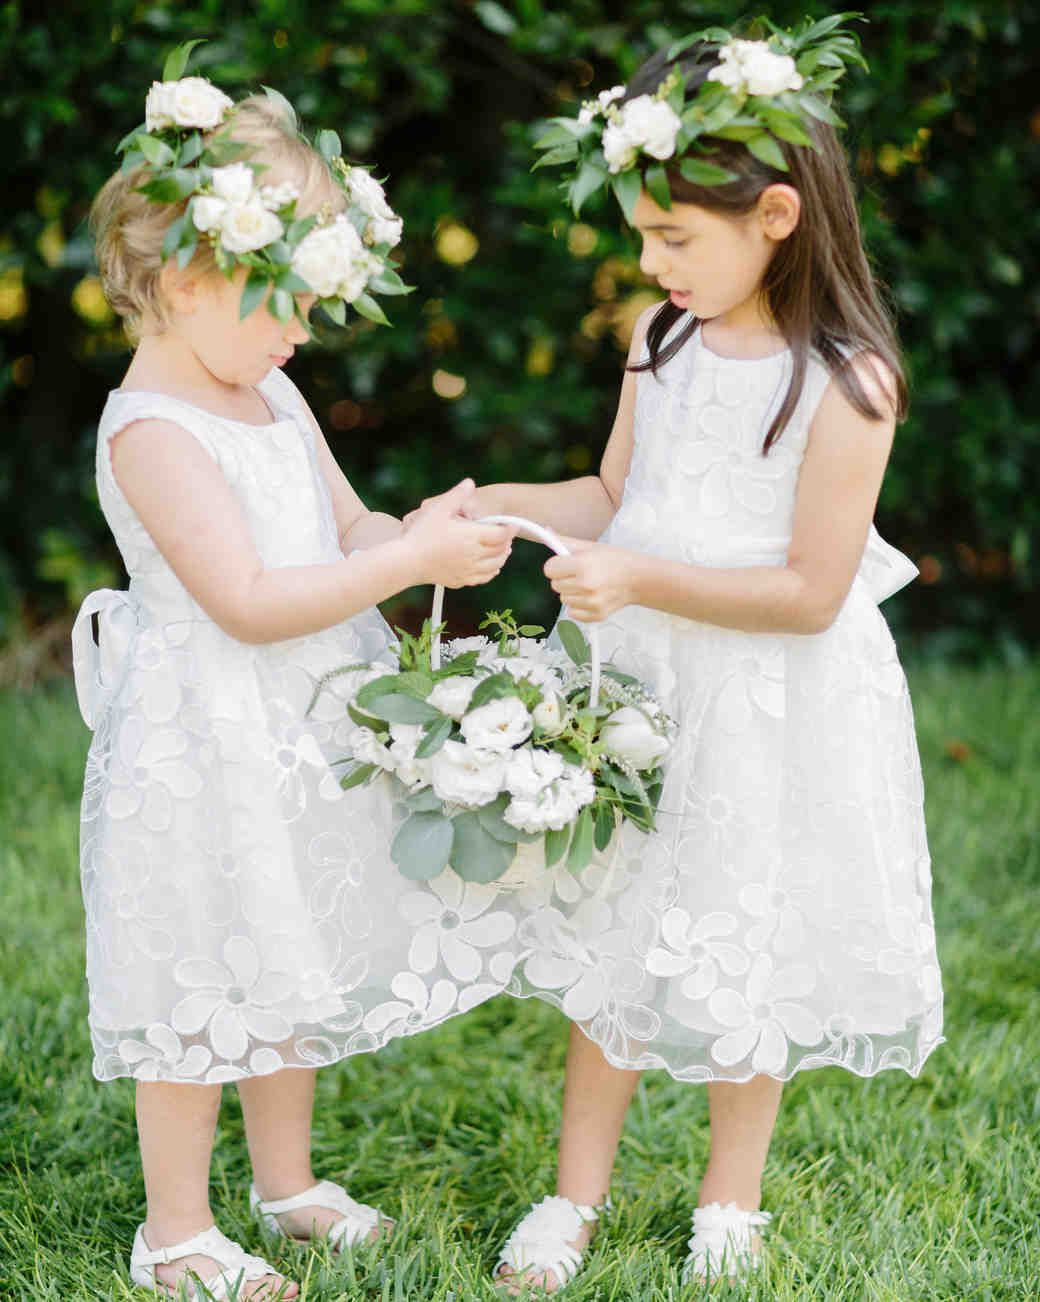 two flower girls holding a white wicker basket